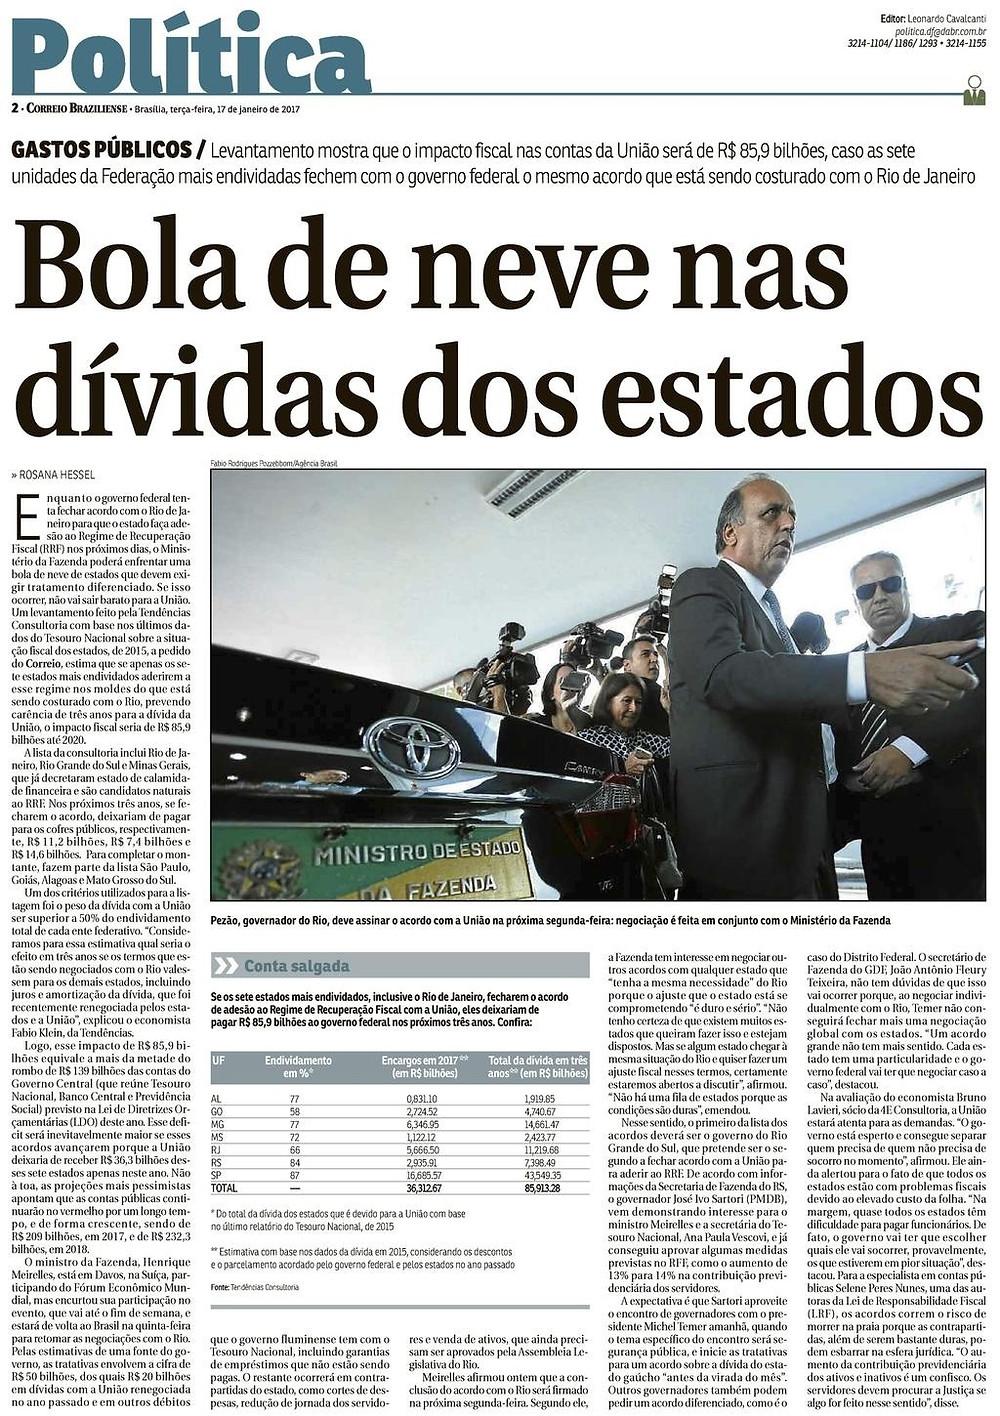 Bola de neve nas dívidas dos estados - Correio Braziliense - Blog da Selene